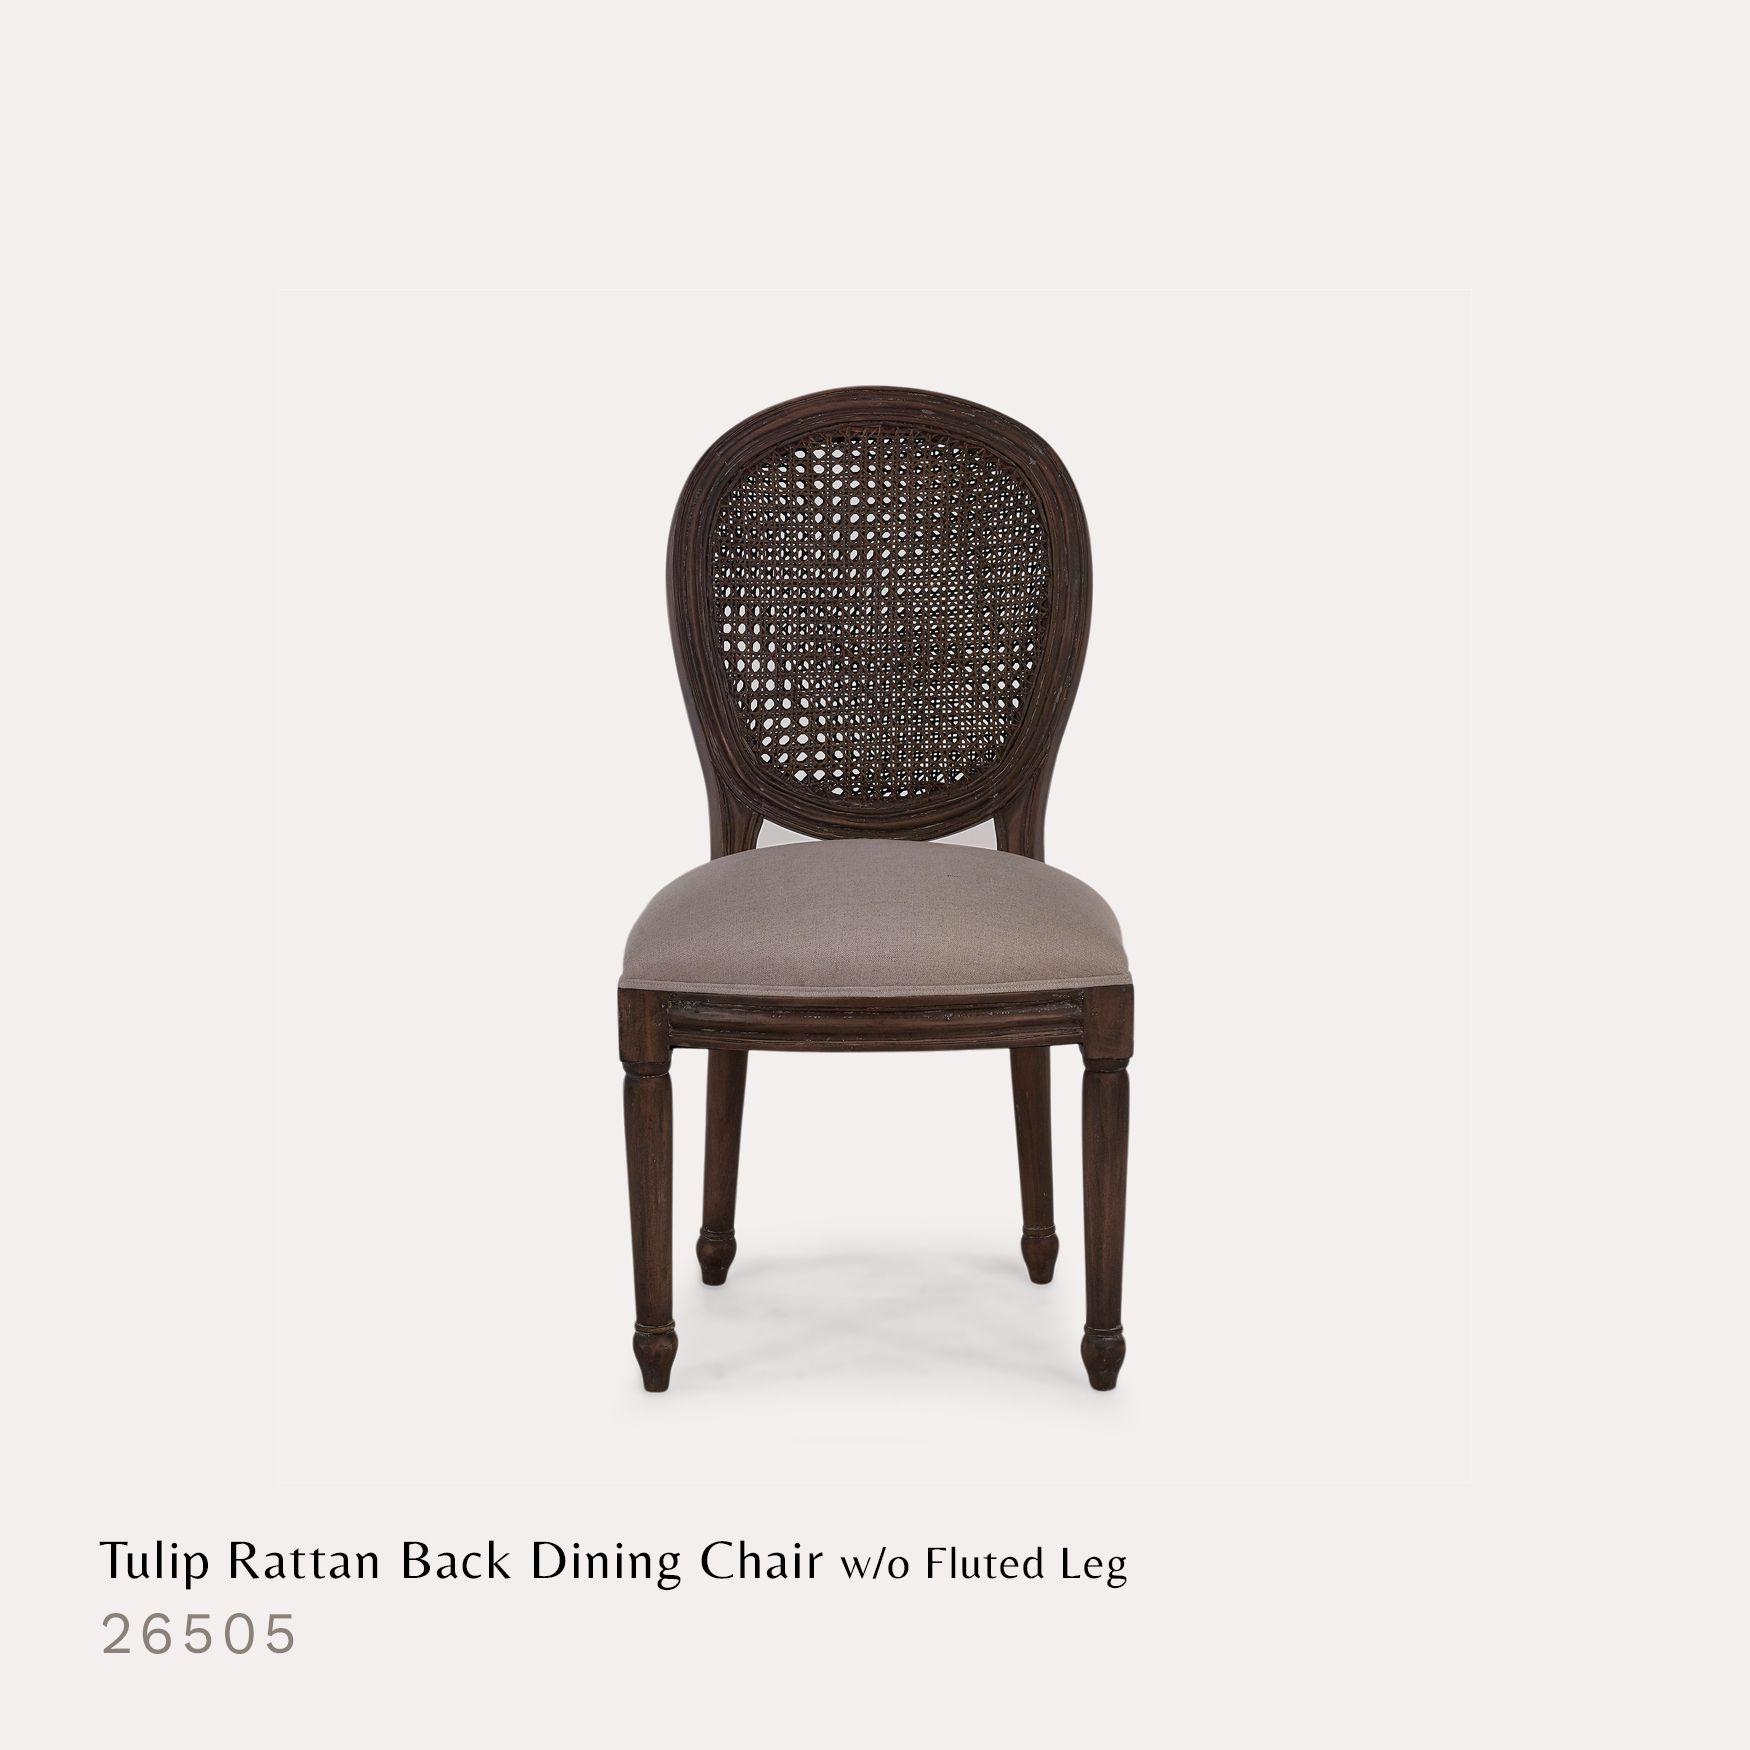 Tulip Rattan Back Dining Arm Chair Bramble Furniture Dining Chairs Upholstered Dining Chairs